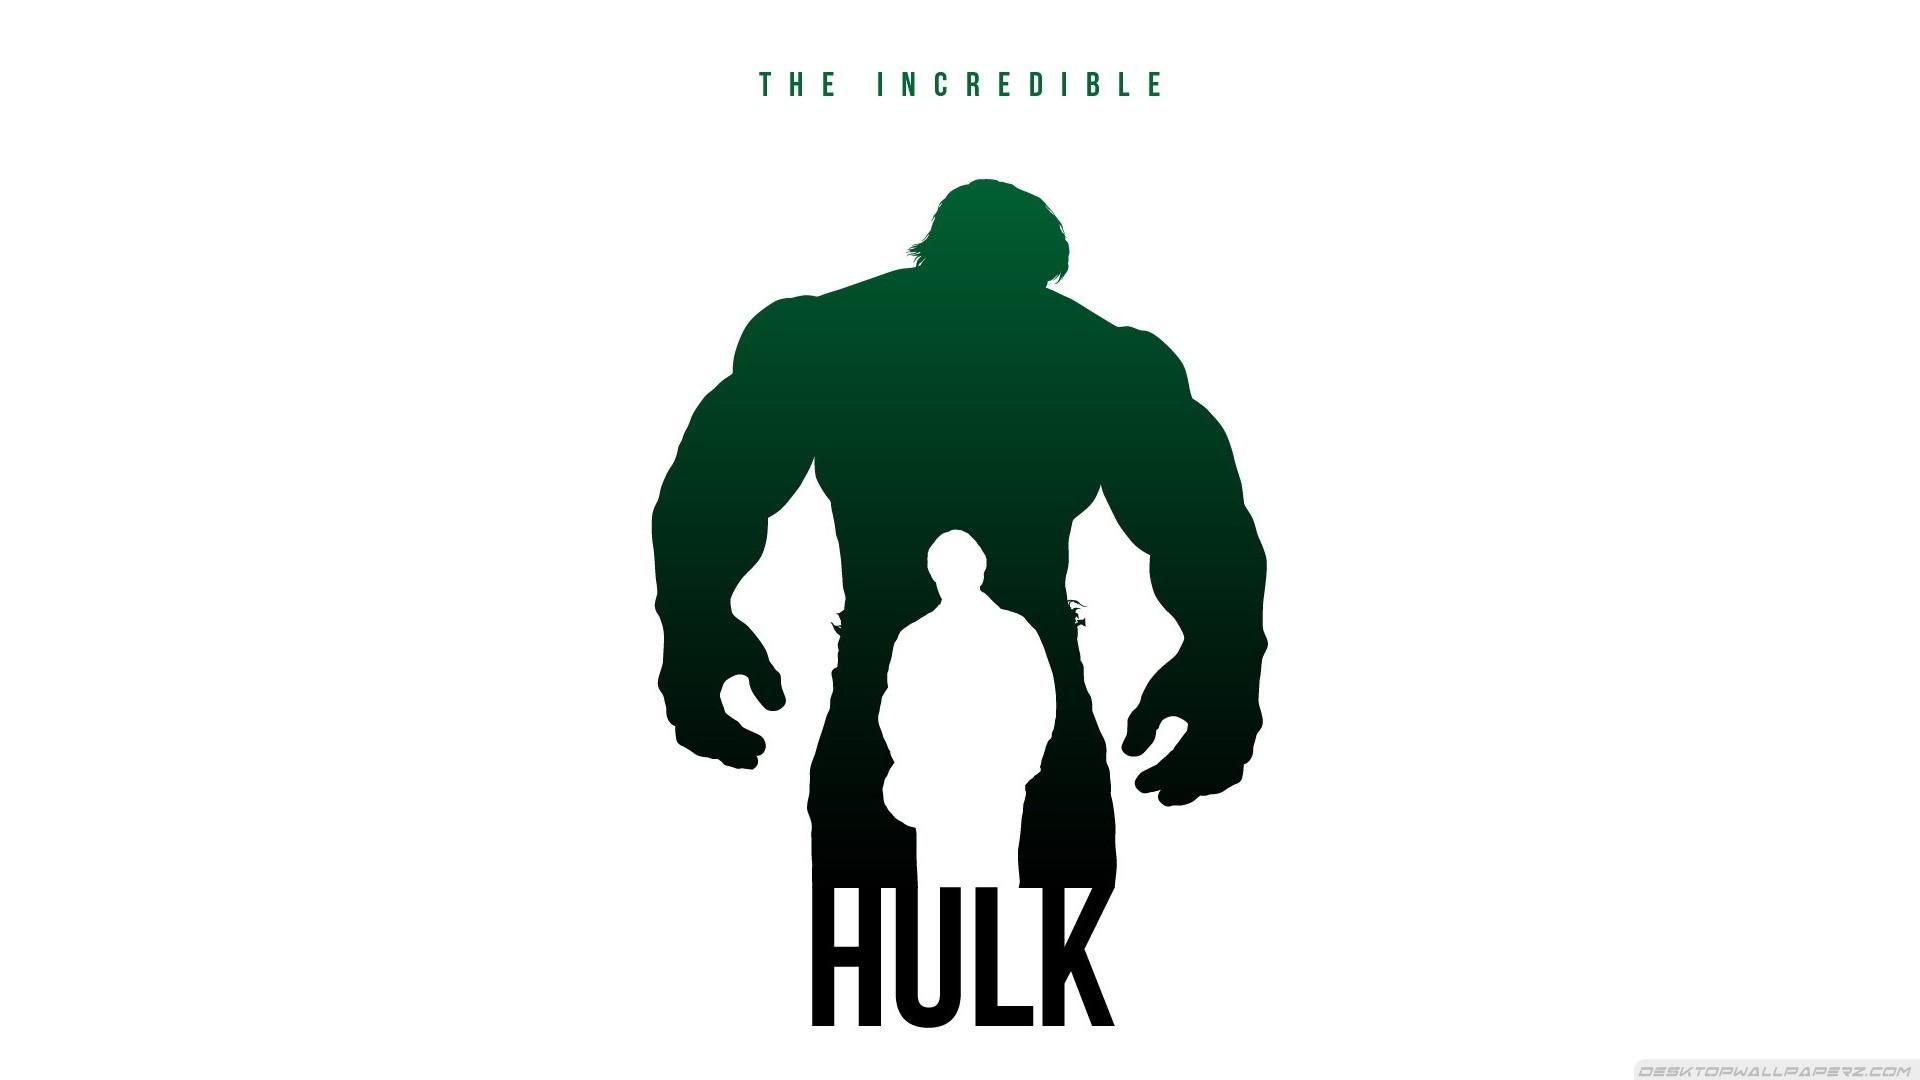 1920x1080 Incredible Hulk Clip Art N6 Free Image